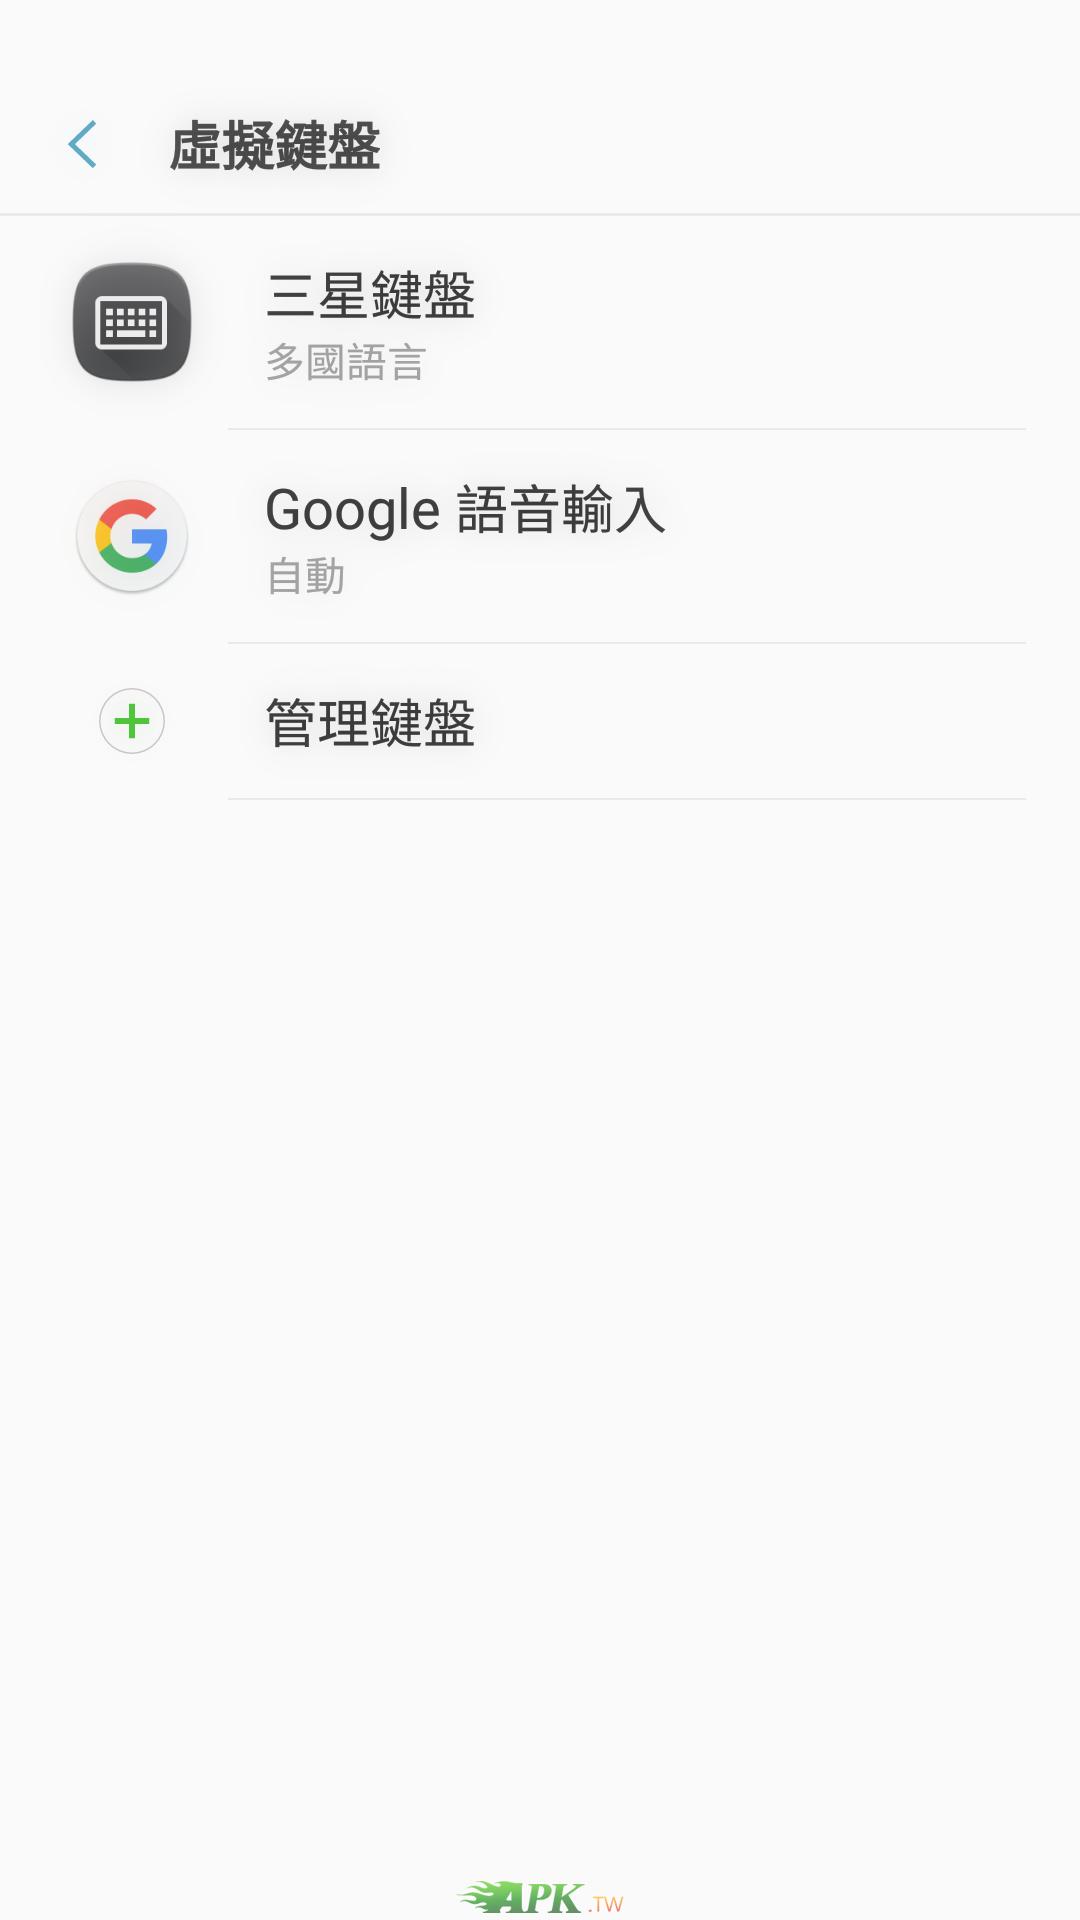 Screenshot_20170207-143432.png